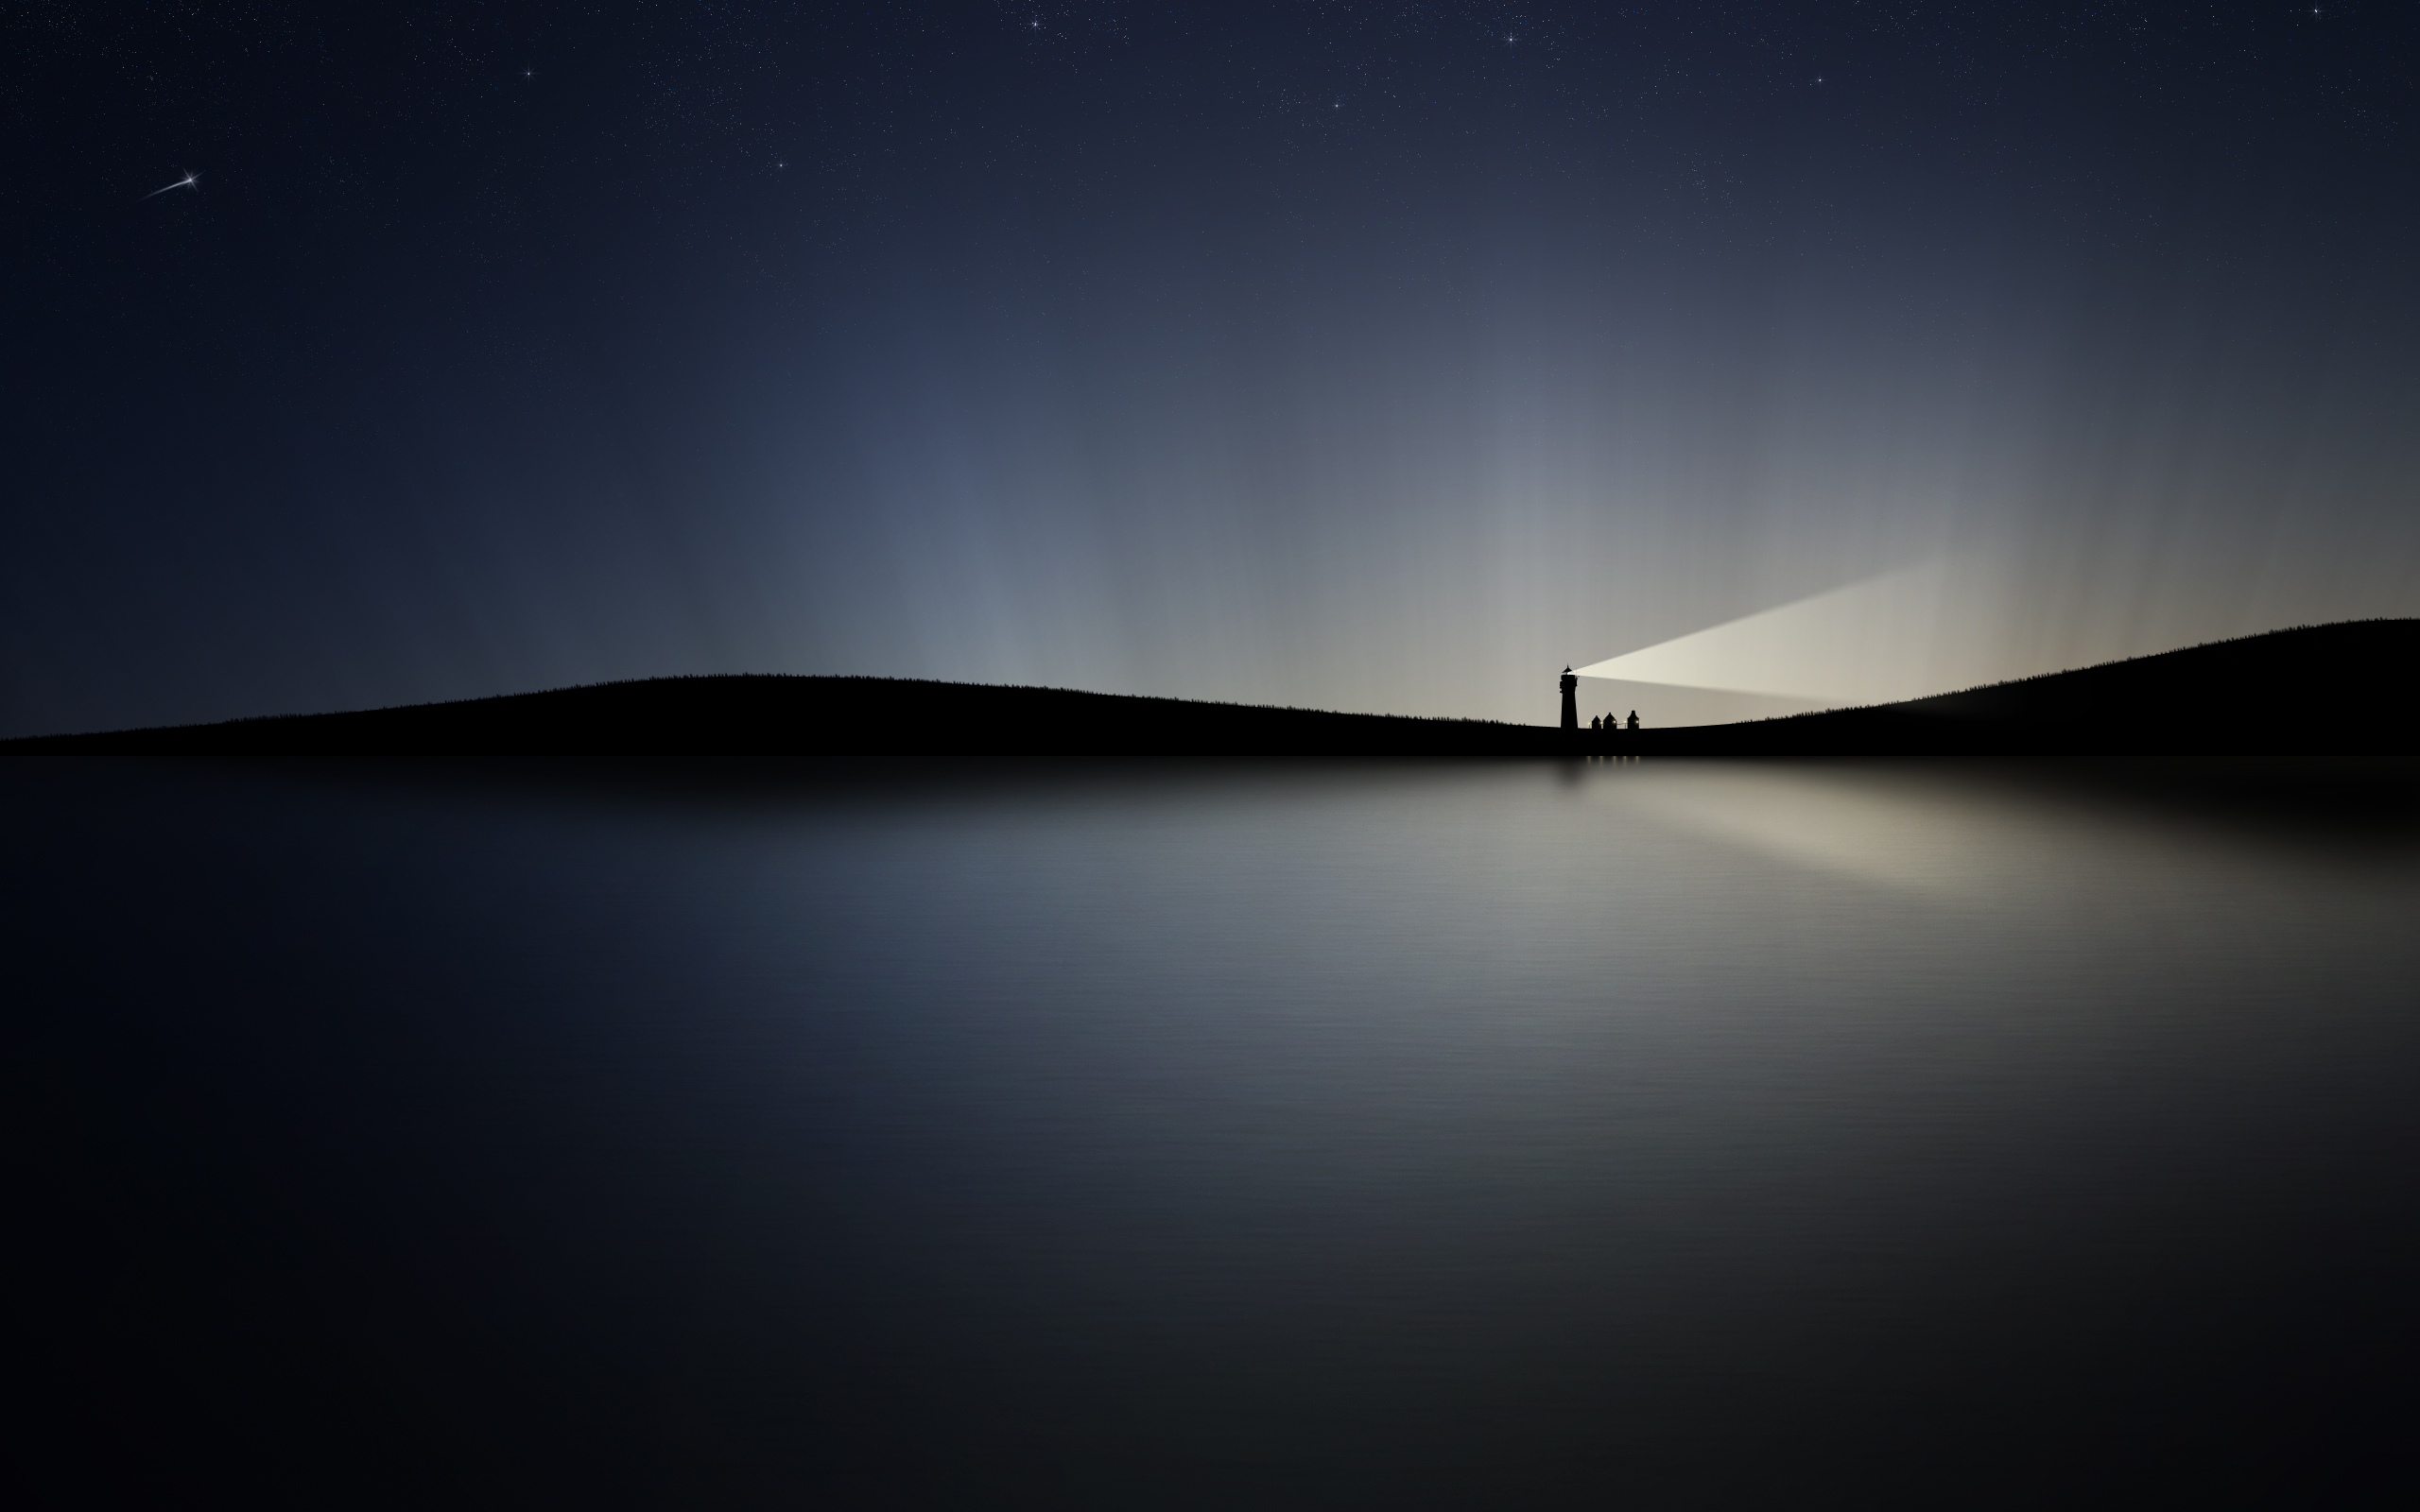 night sky wallpaper download - HD Desktop Wallpapers | 4k HD